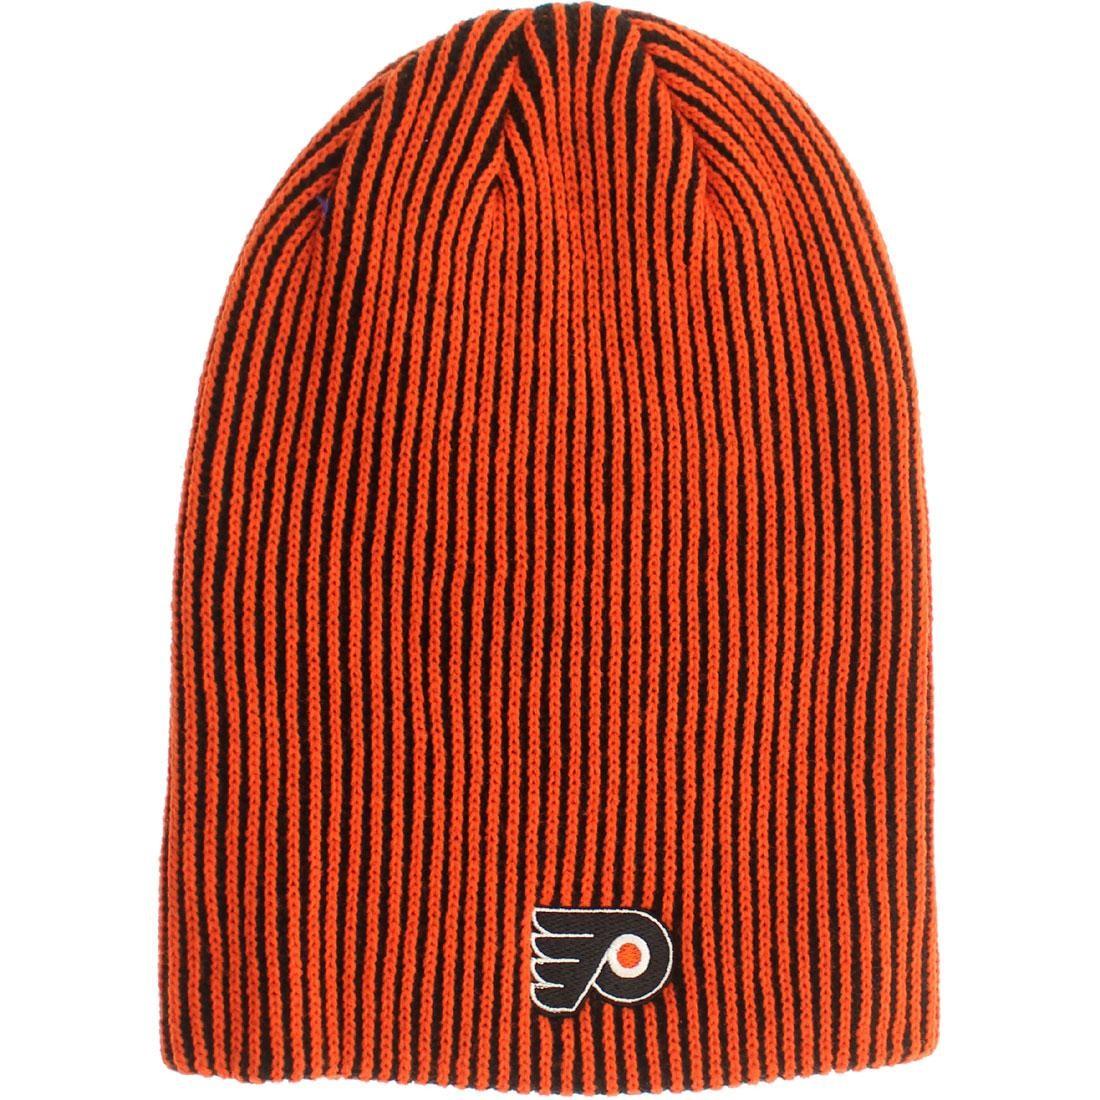 American Needle Philadelphia Flyers Team Switch Knit Beanie (Black / Orange) by Bait